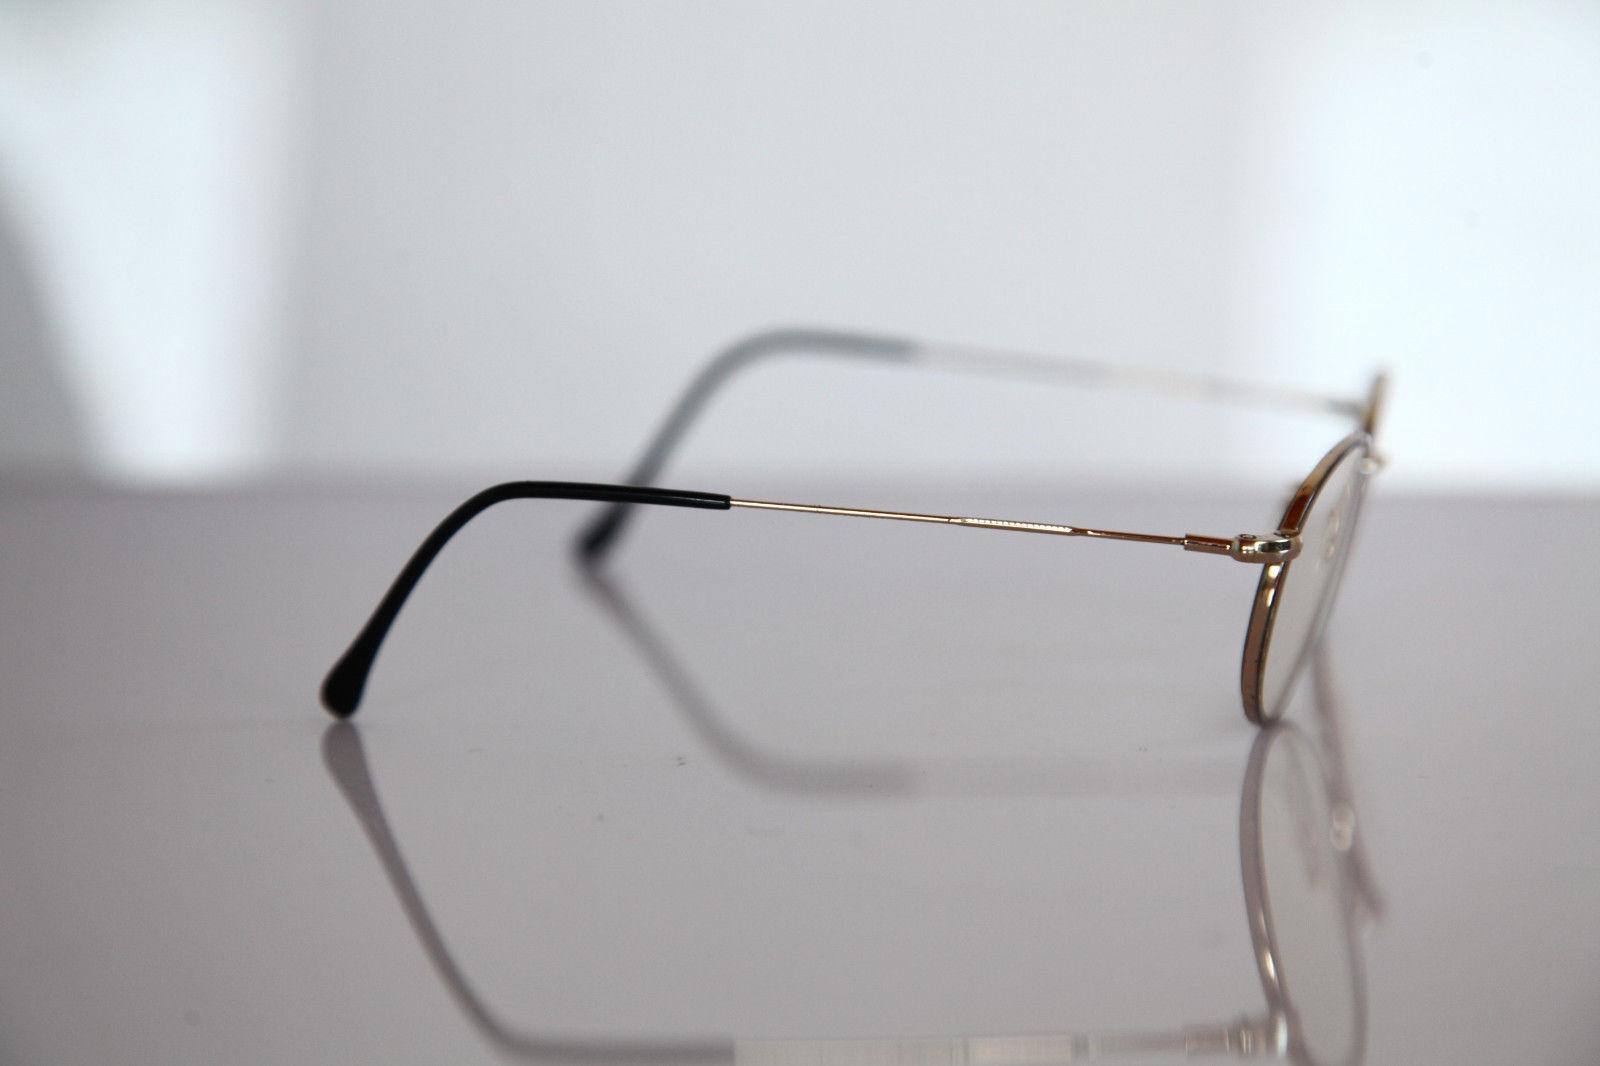 ESSILOR Eyewear, Gold, Multi-color Frame,  RX-Able Prescription Lenses.